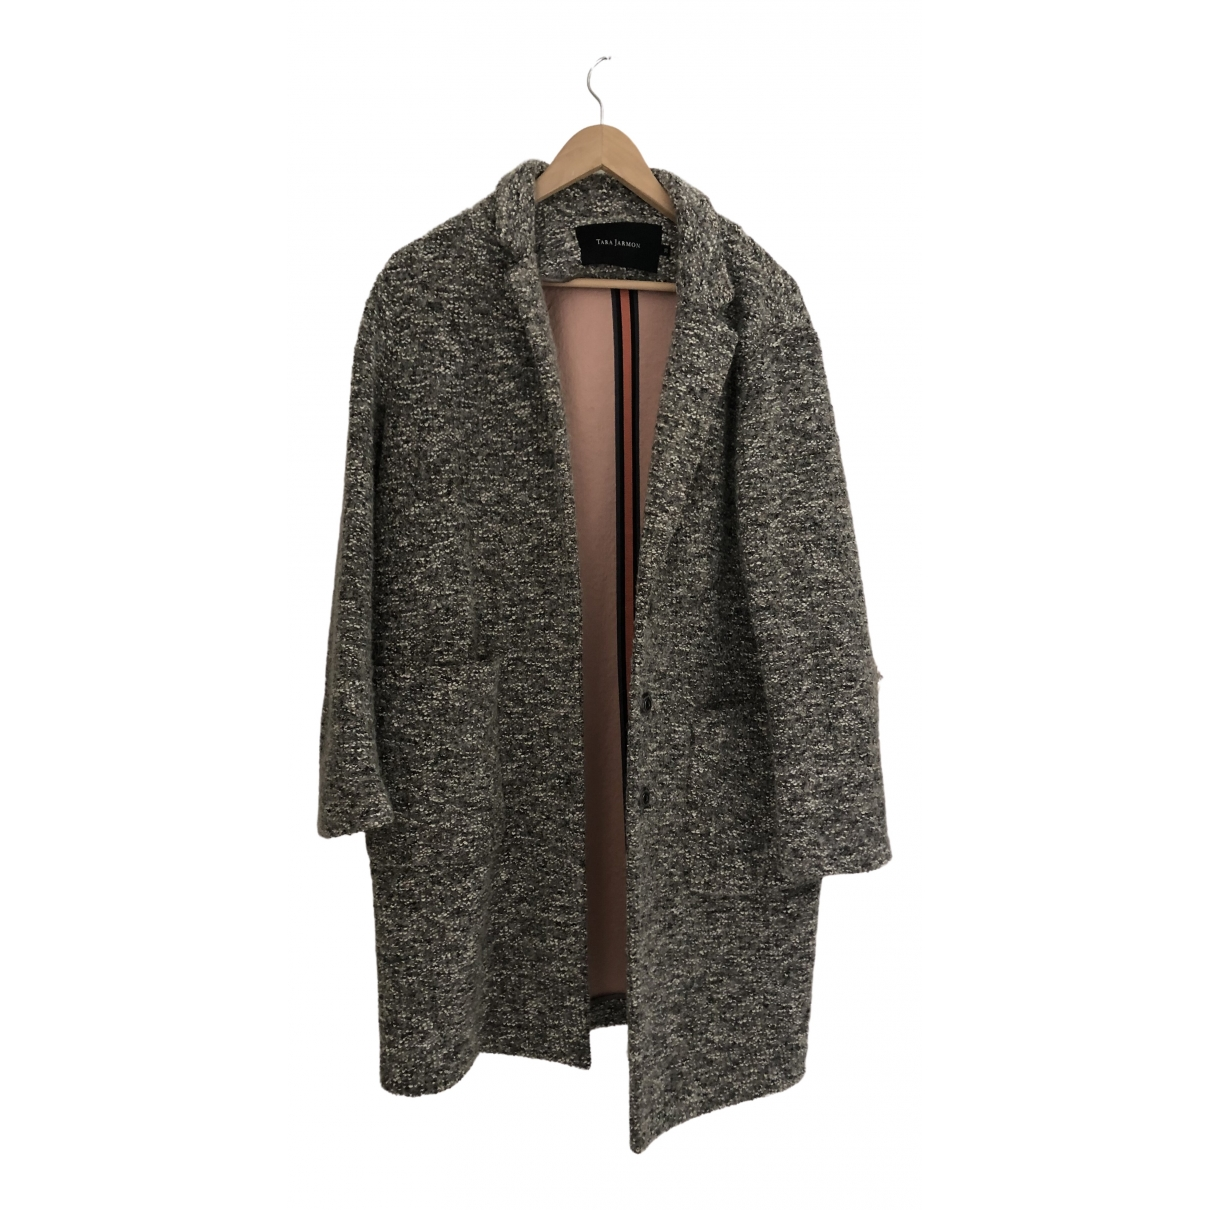 Tara Jarmon \N Grey coat for Women 38 IT